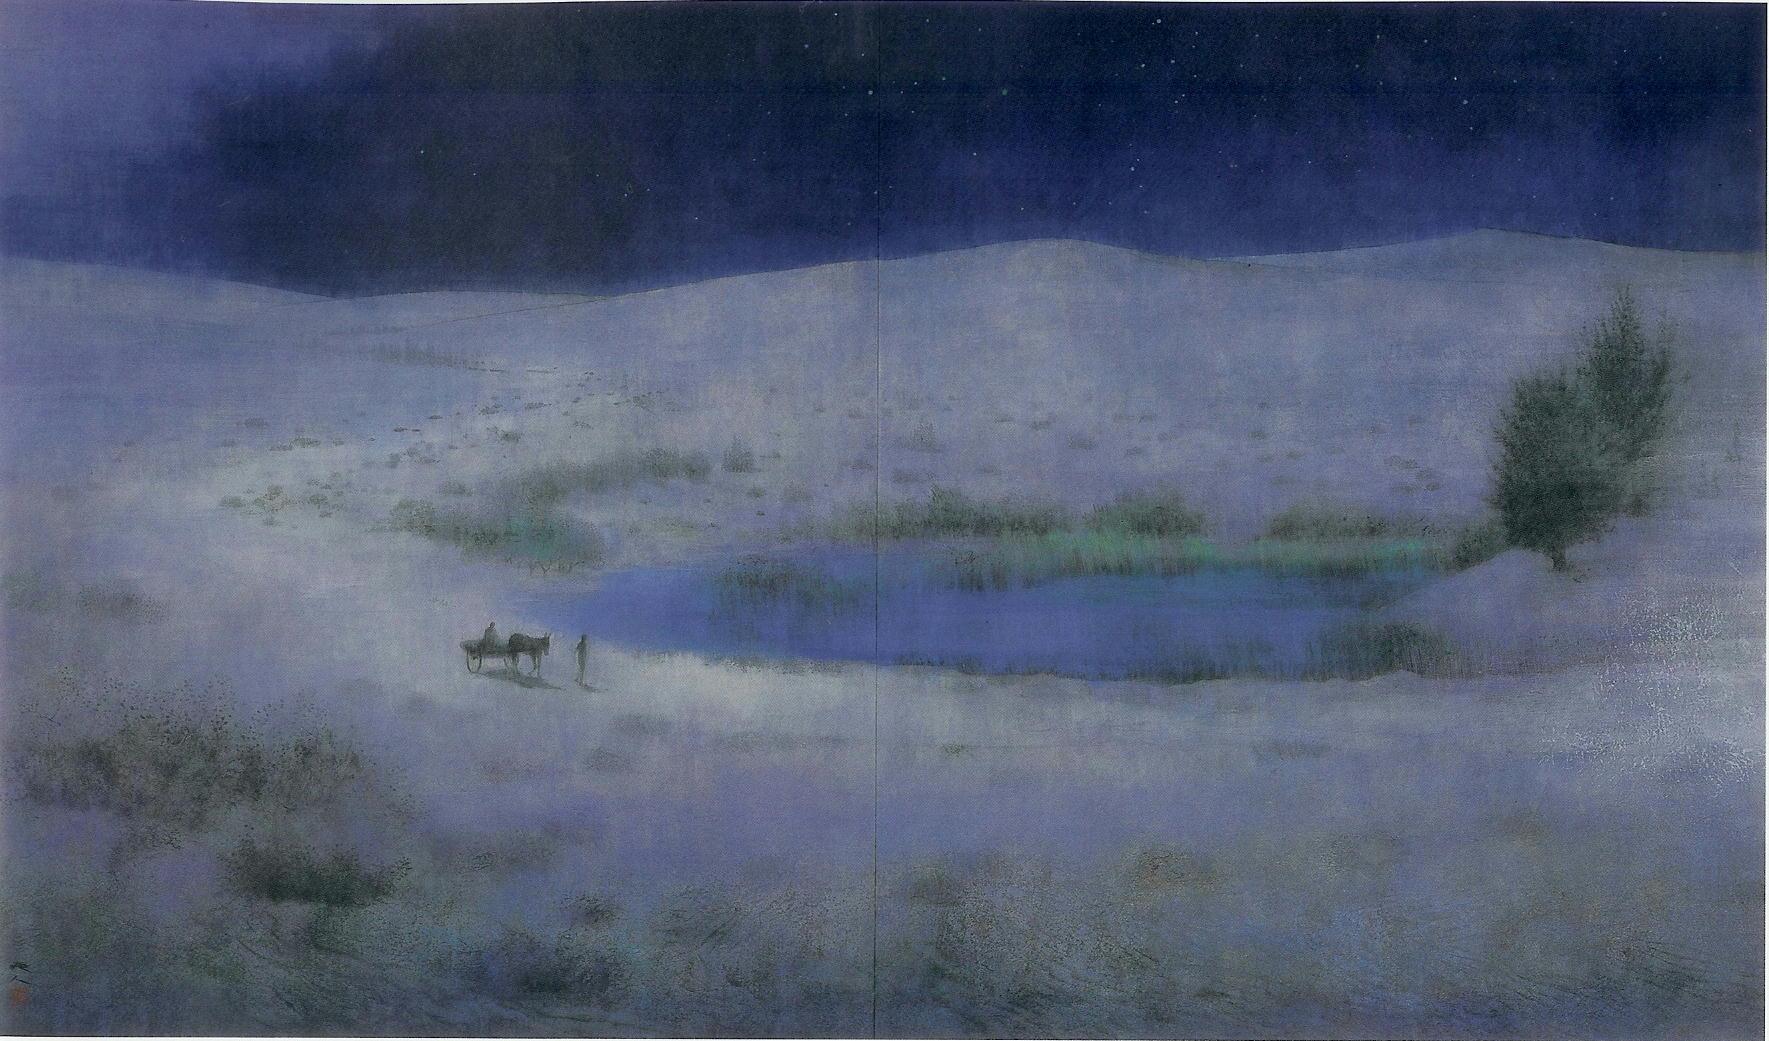 Fukui Sawato img227.jpg